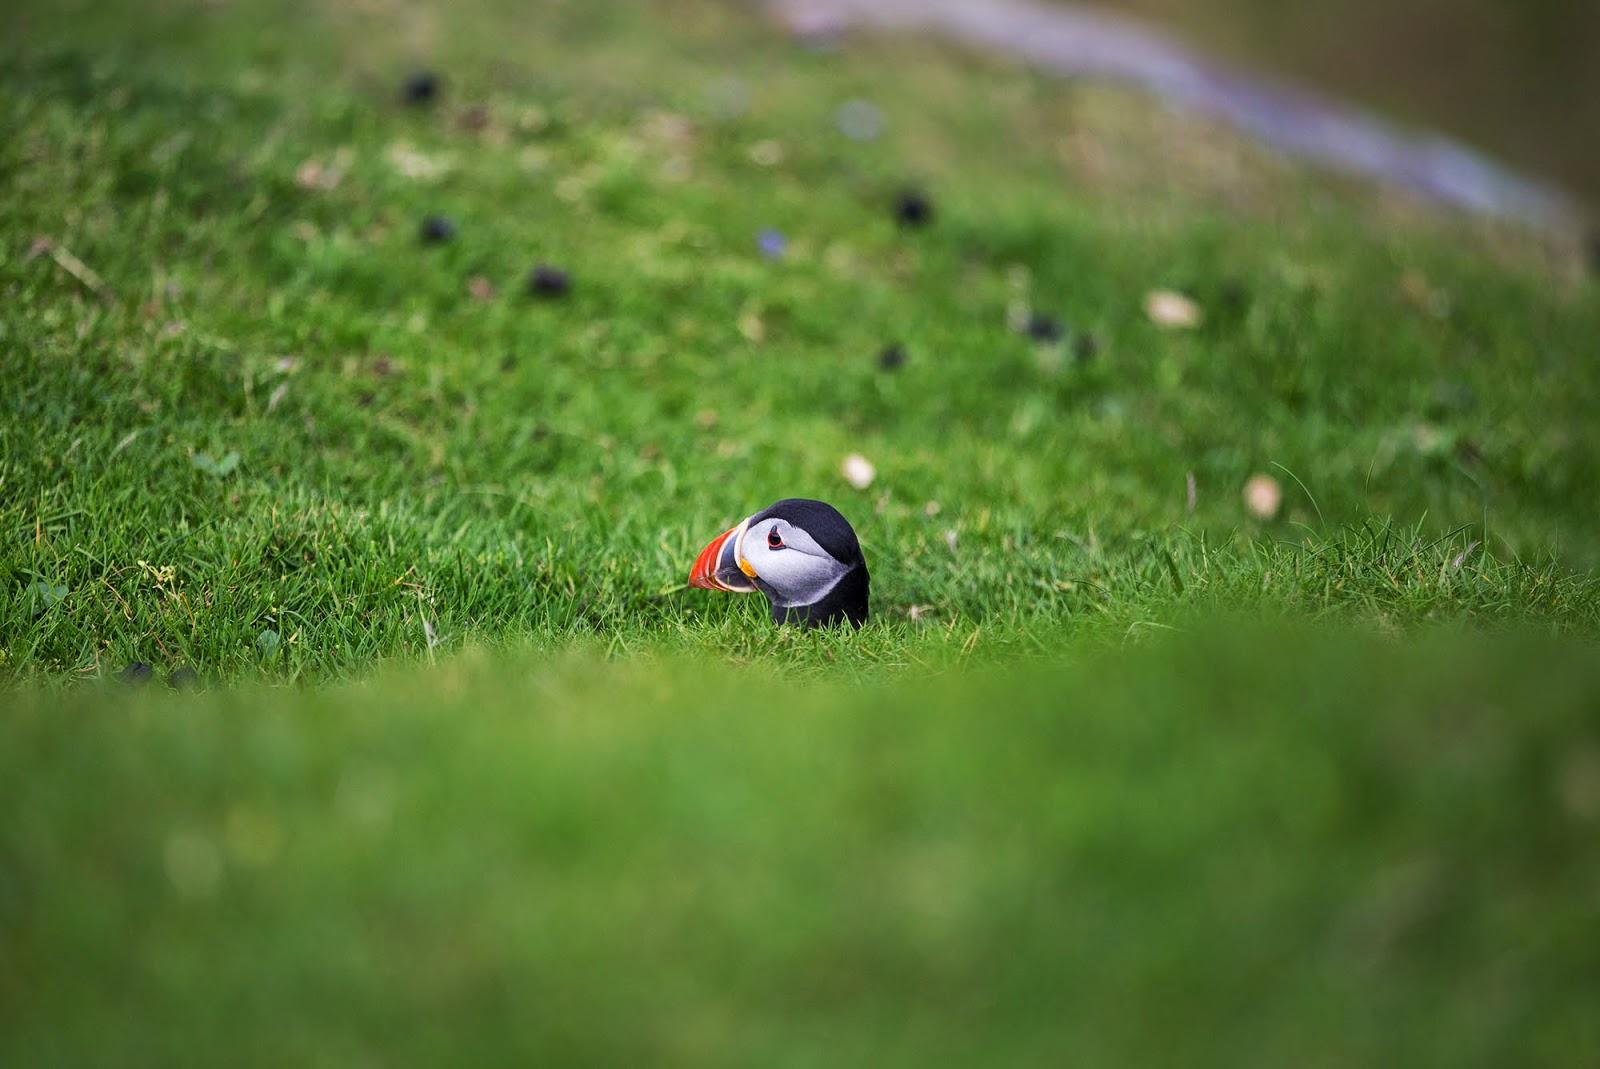 Puffin in The Shetland Islands, Scotland